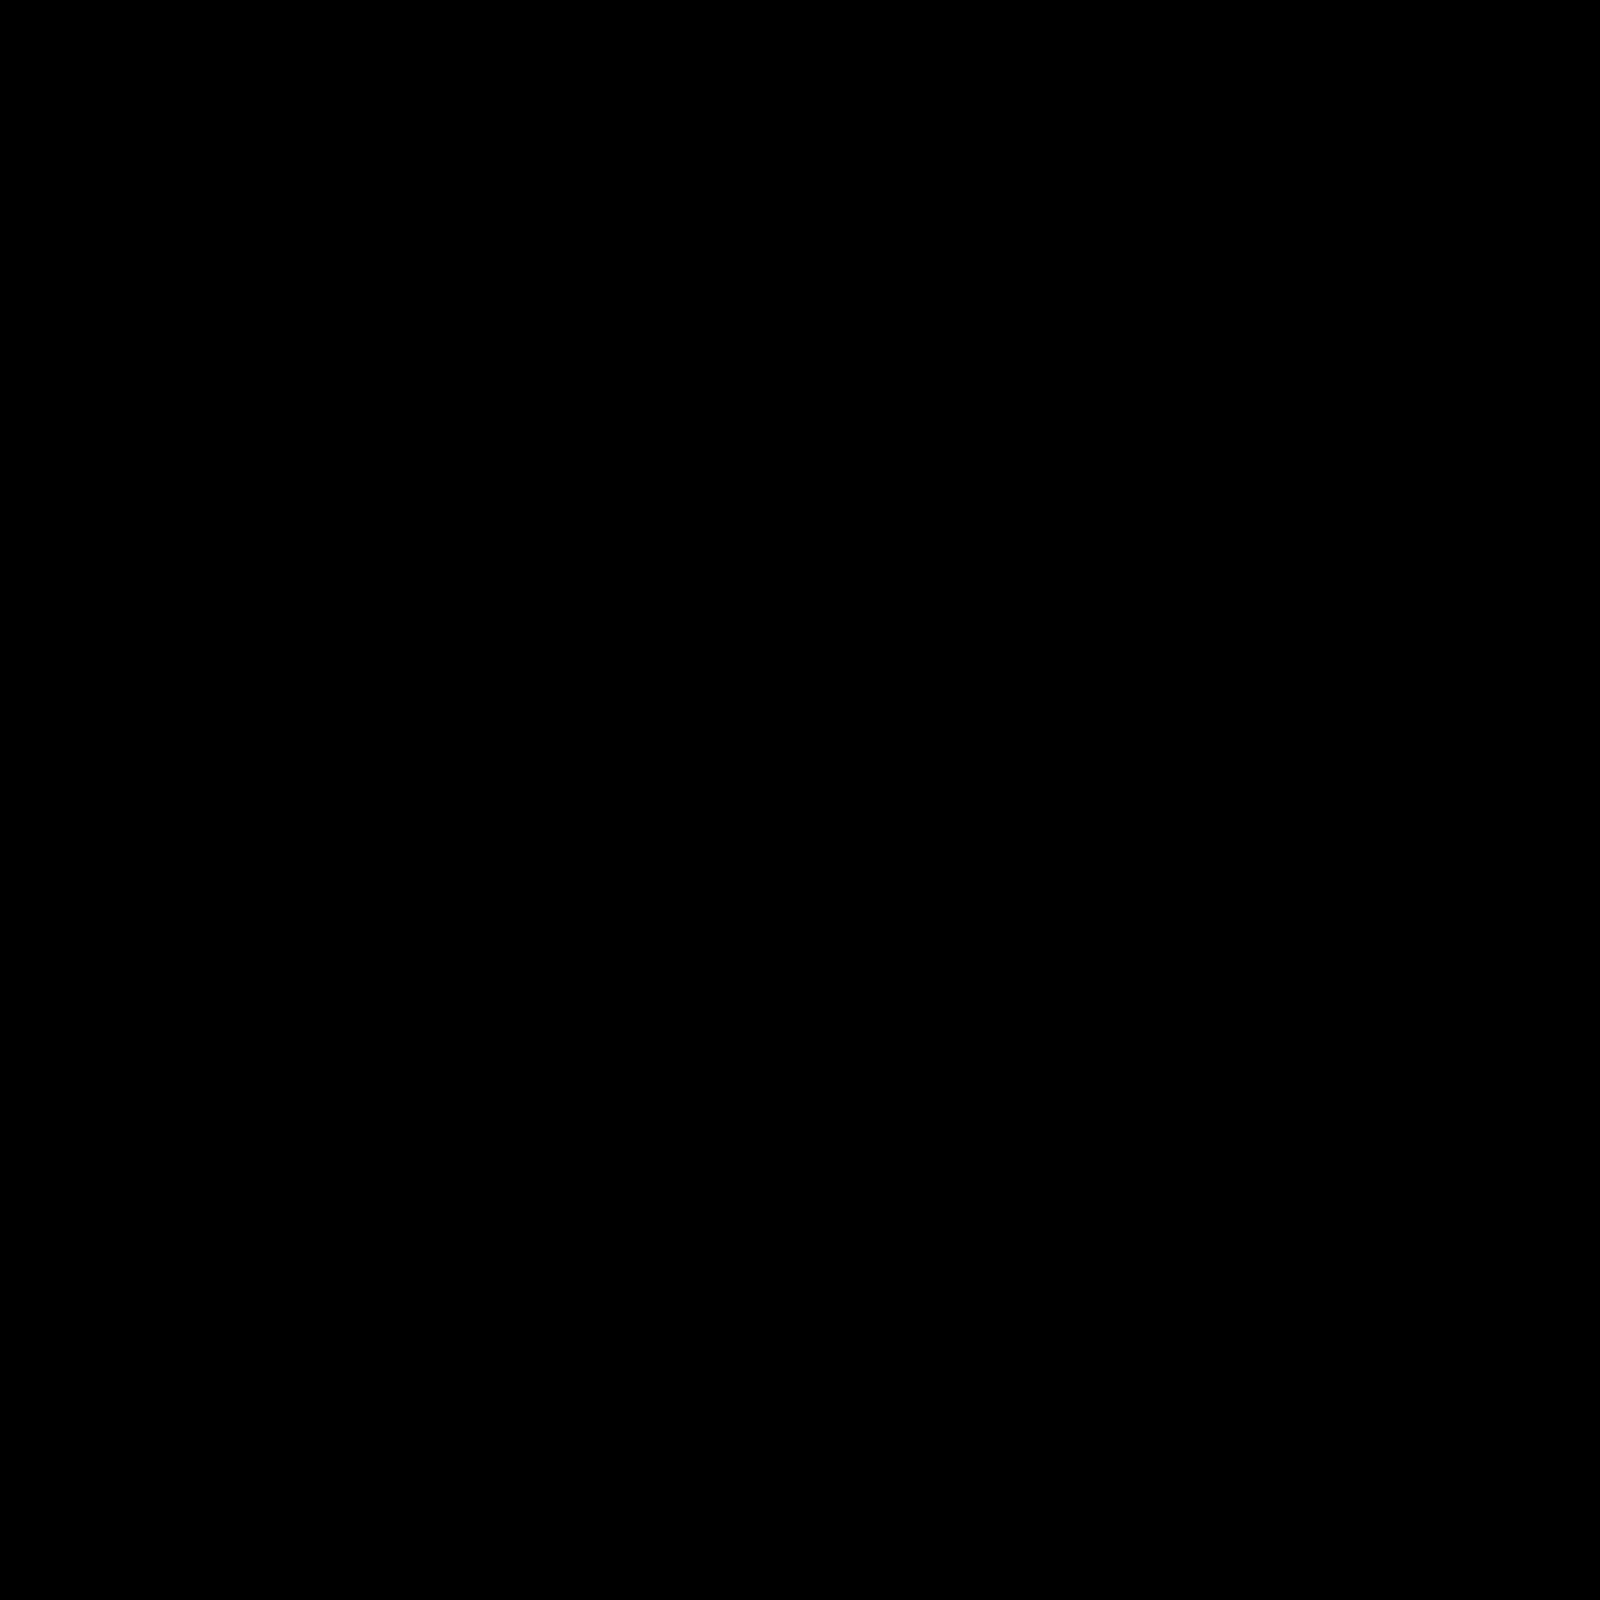 Vector String